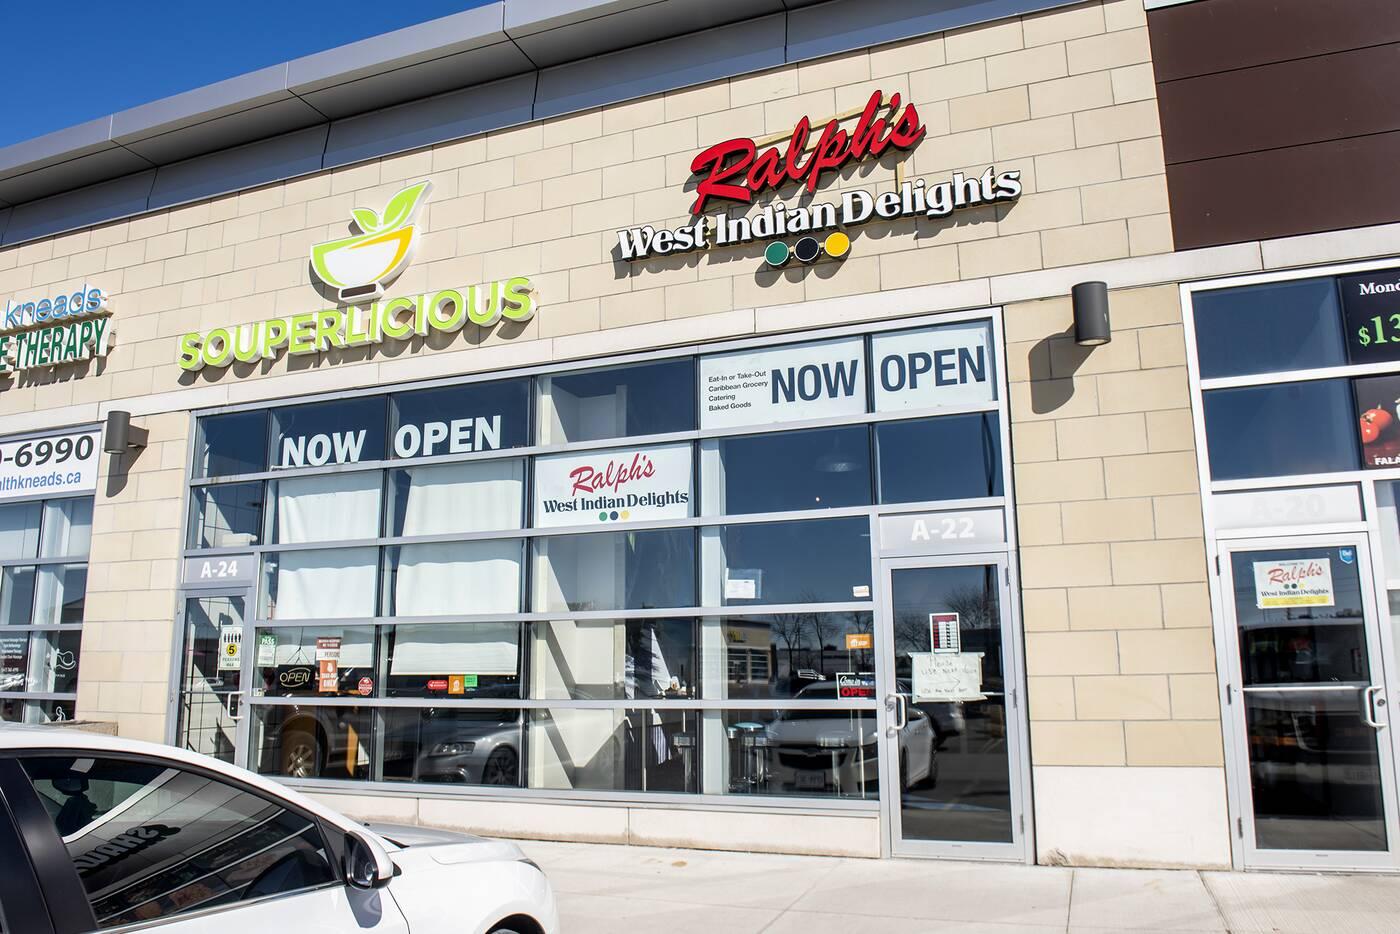 Ralphs West Indian Delights Toronto